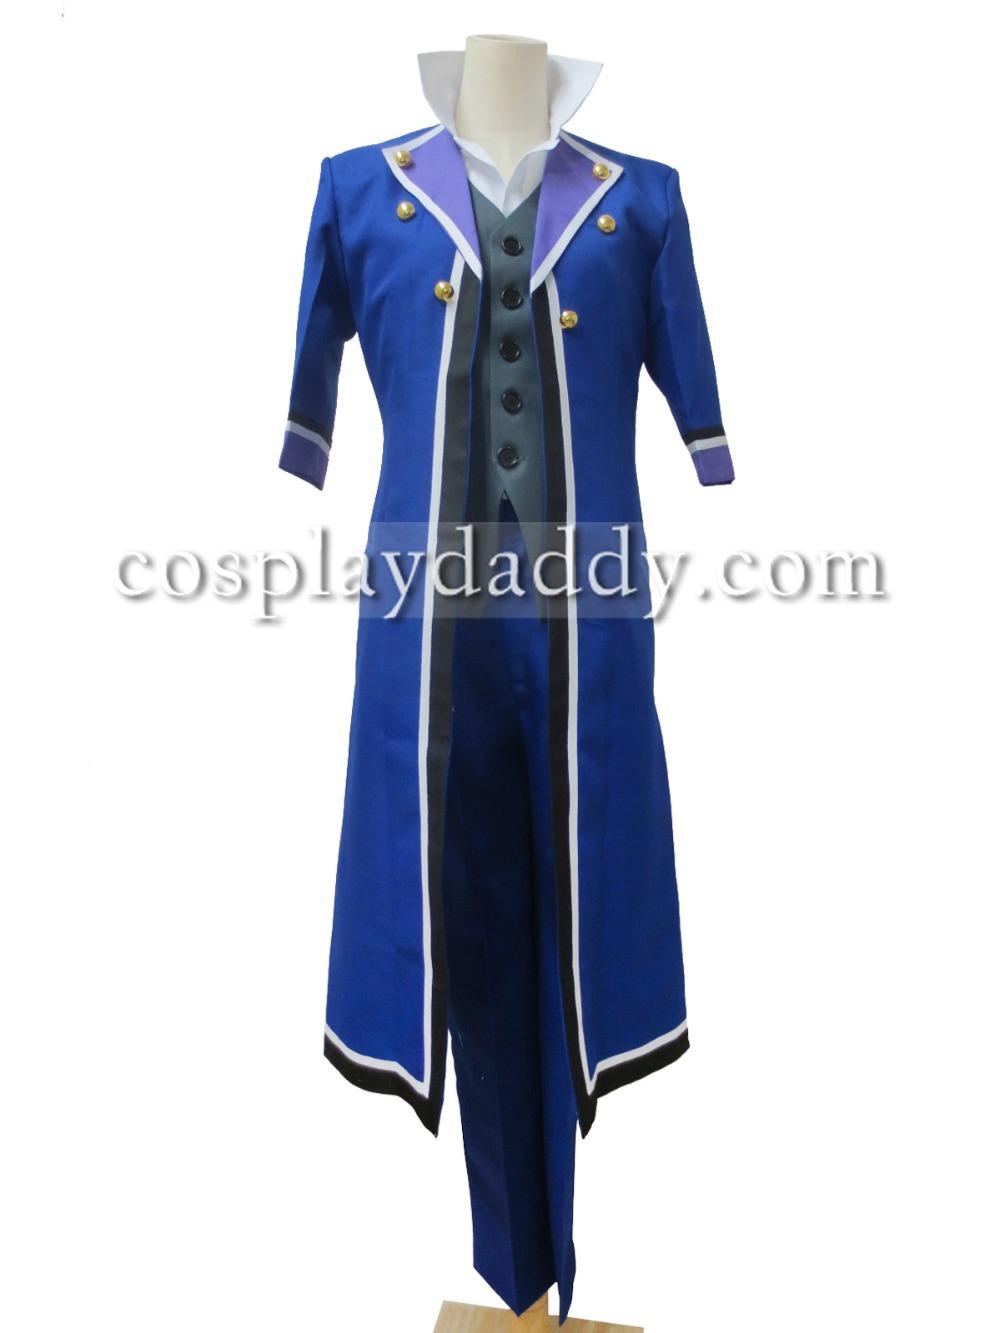 Japanese Anime K Project Saruhiko Fushimi Cosplay Costumes new outfit